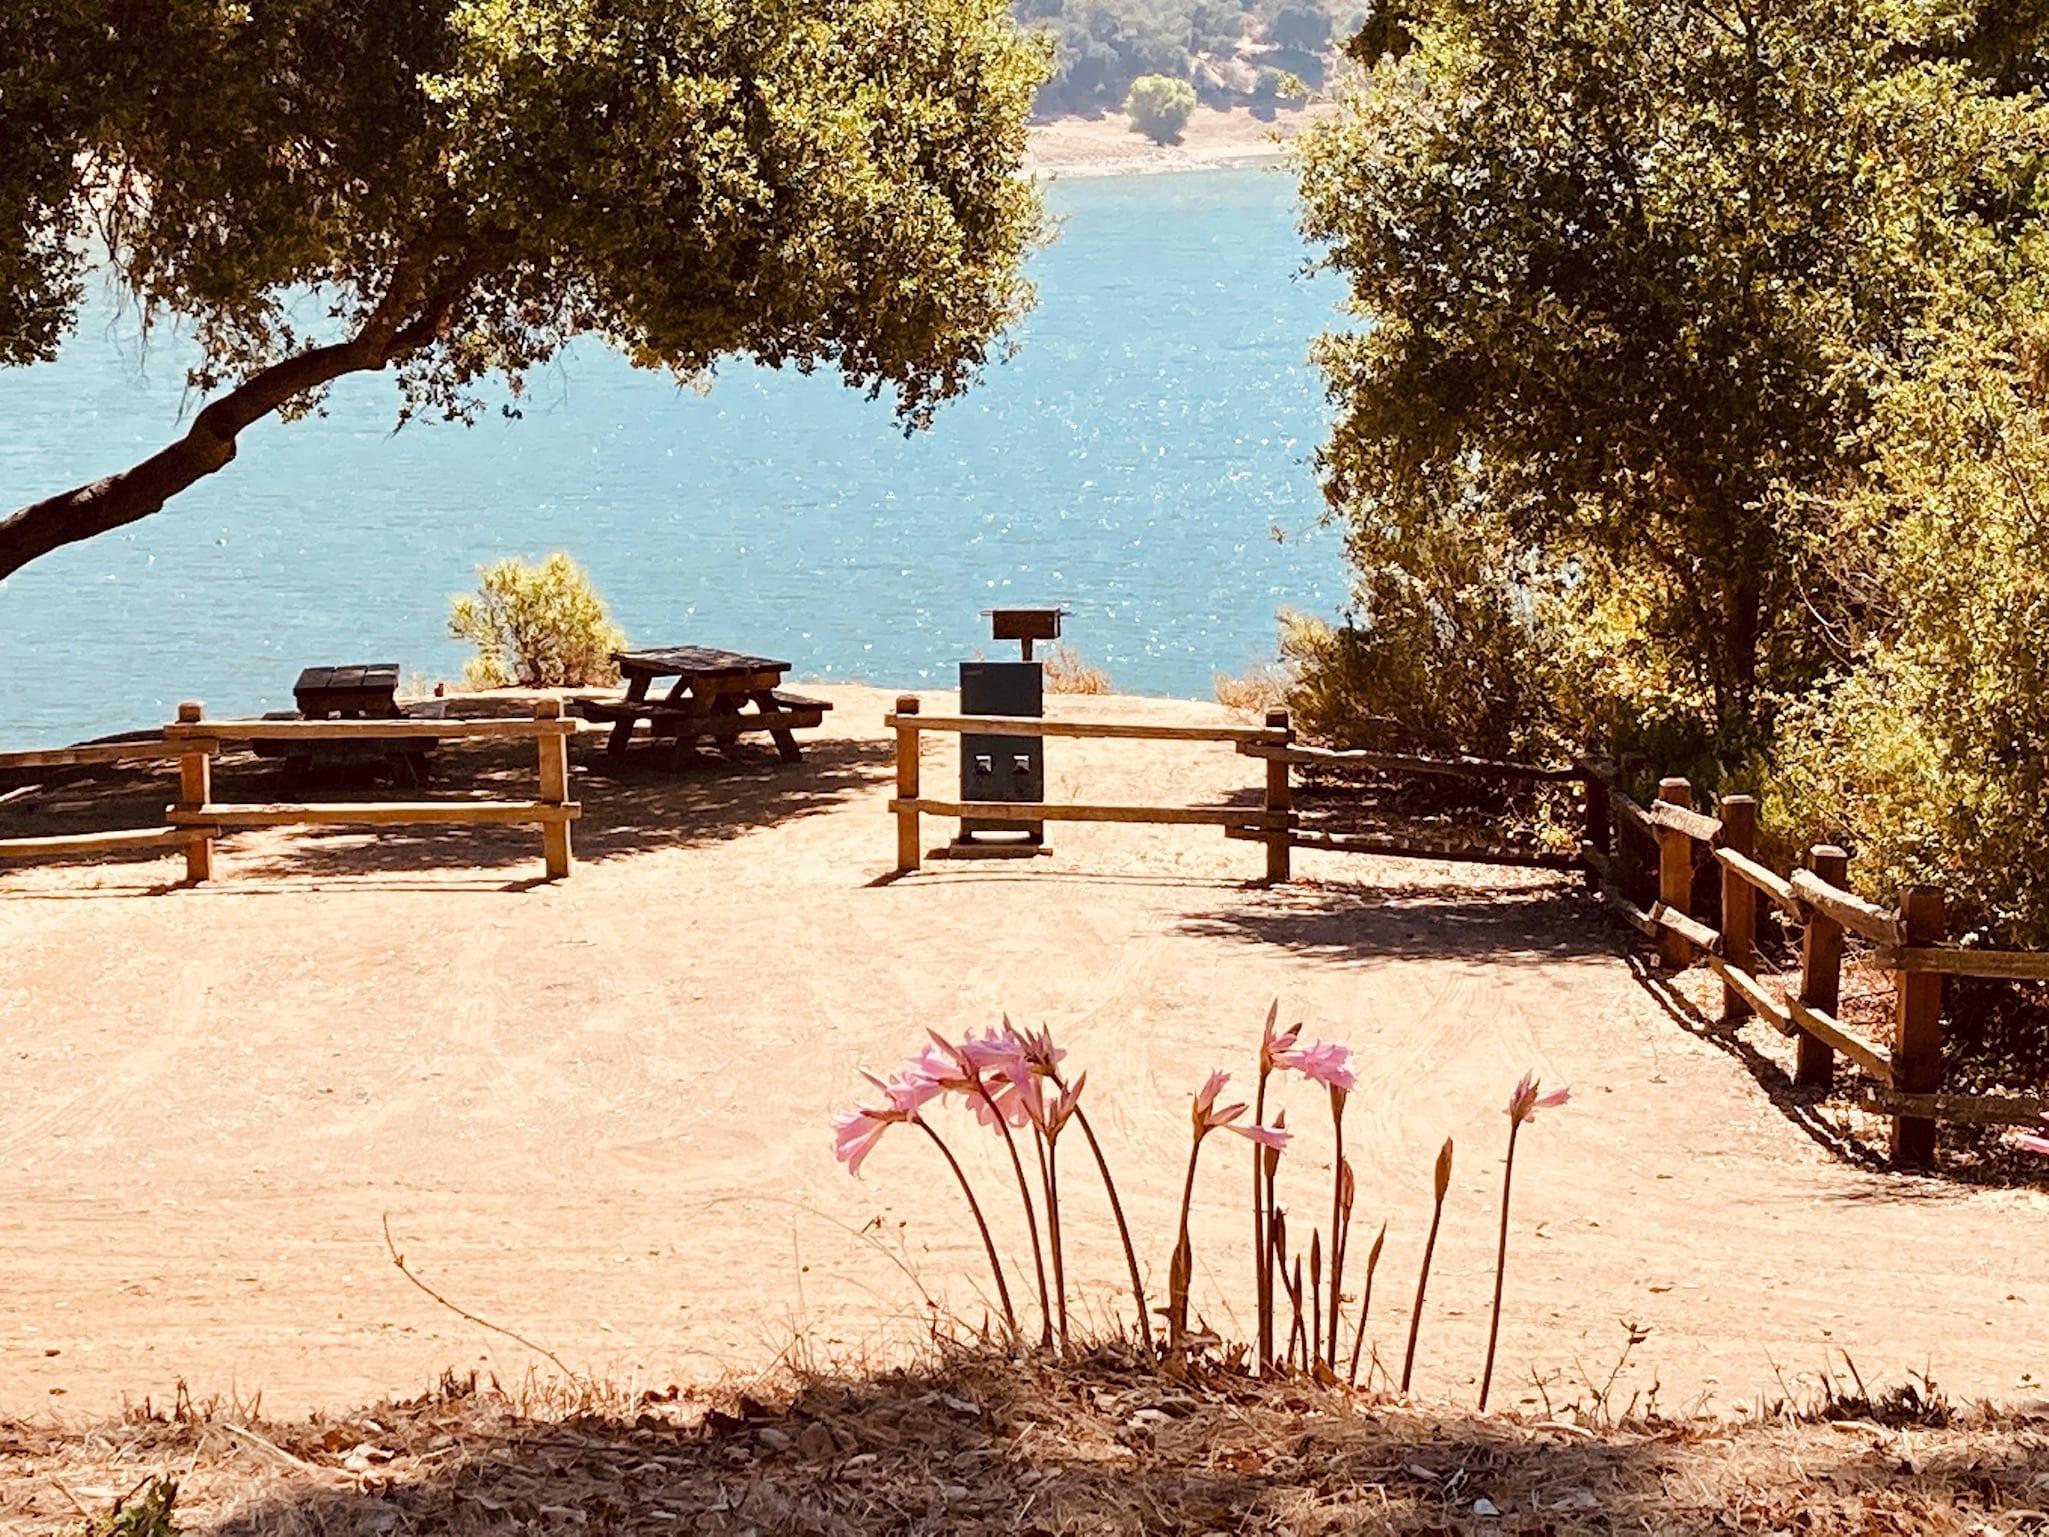 Picnic Table at Faultline Picnic Area, Coyote Lake